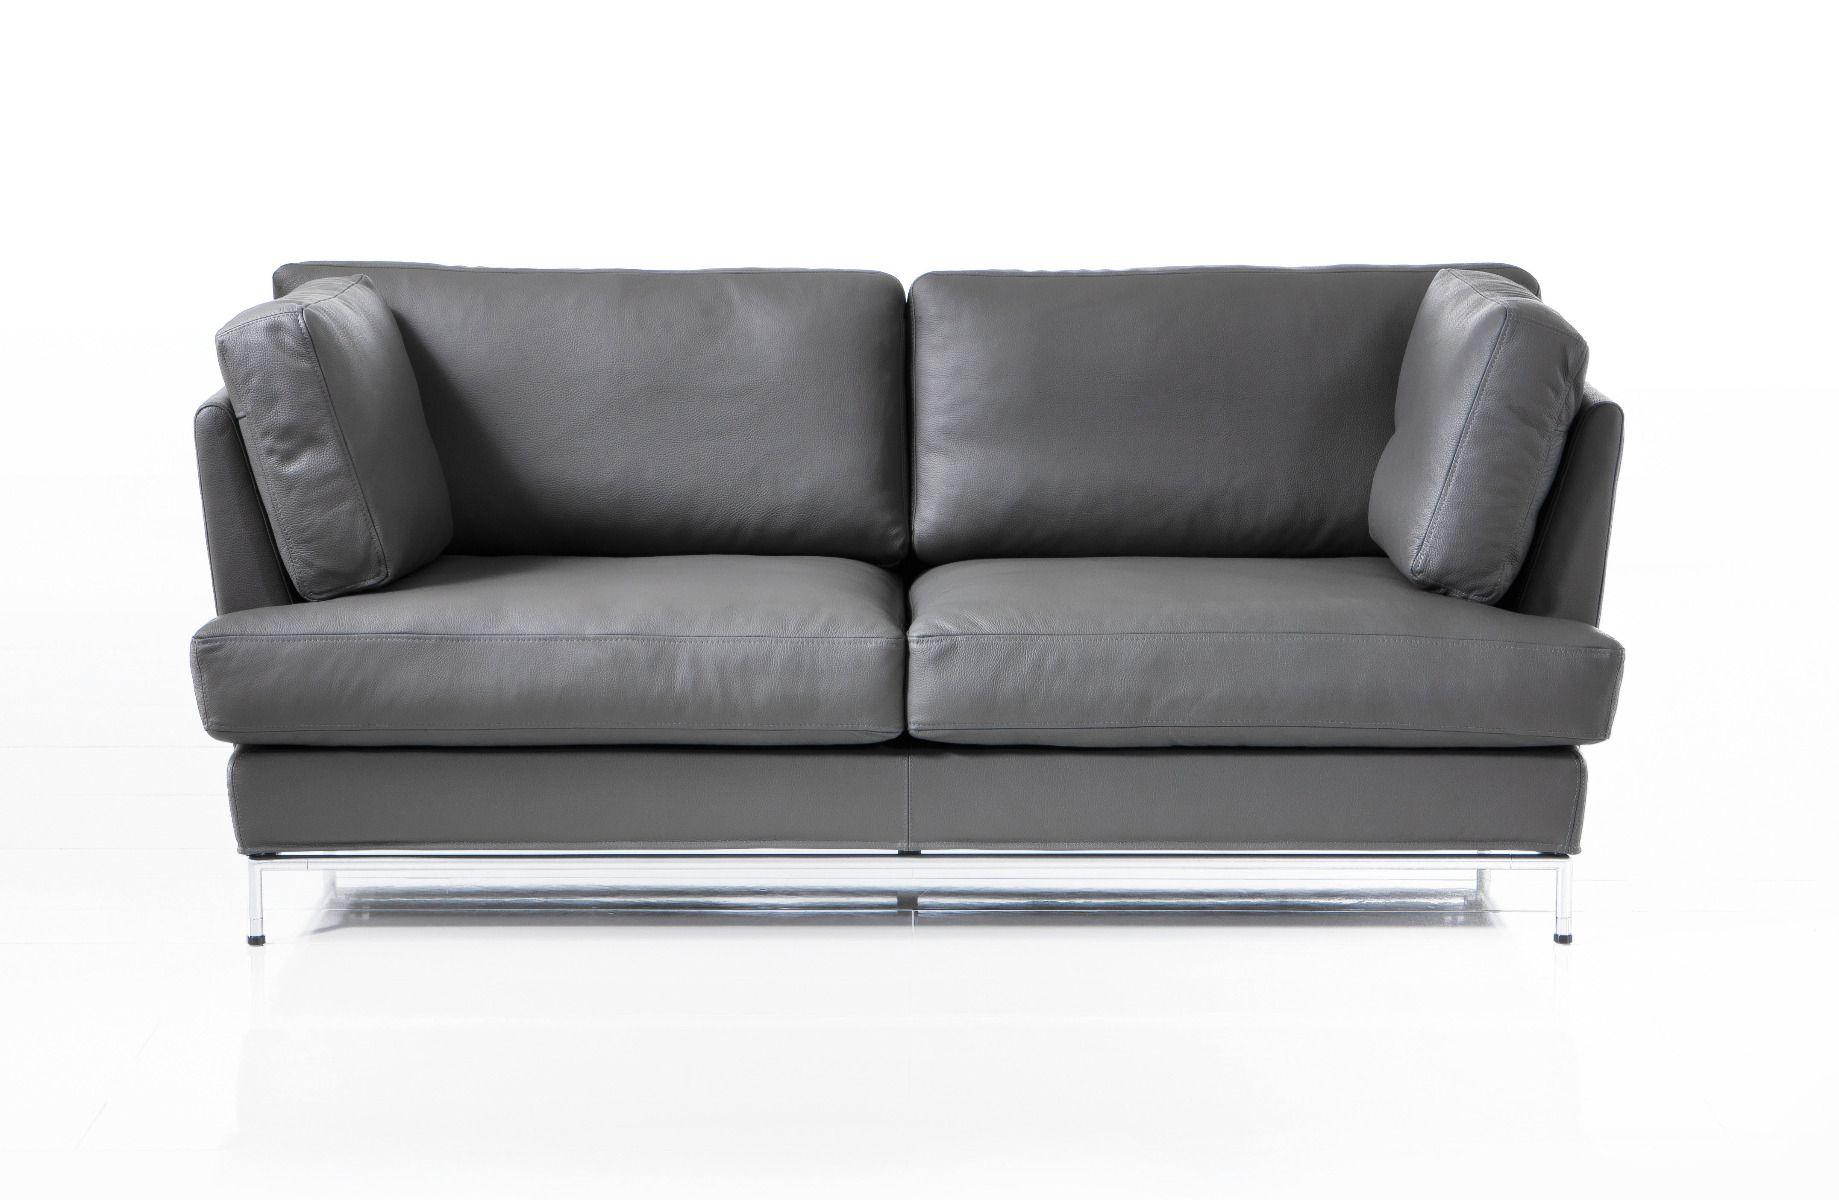 Brühl Carousel Sofa Online Kaufen Bei Schlafsofa Shopde